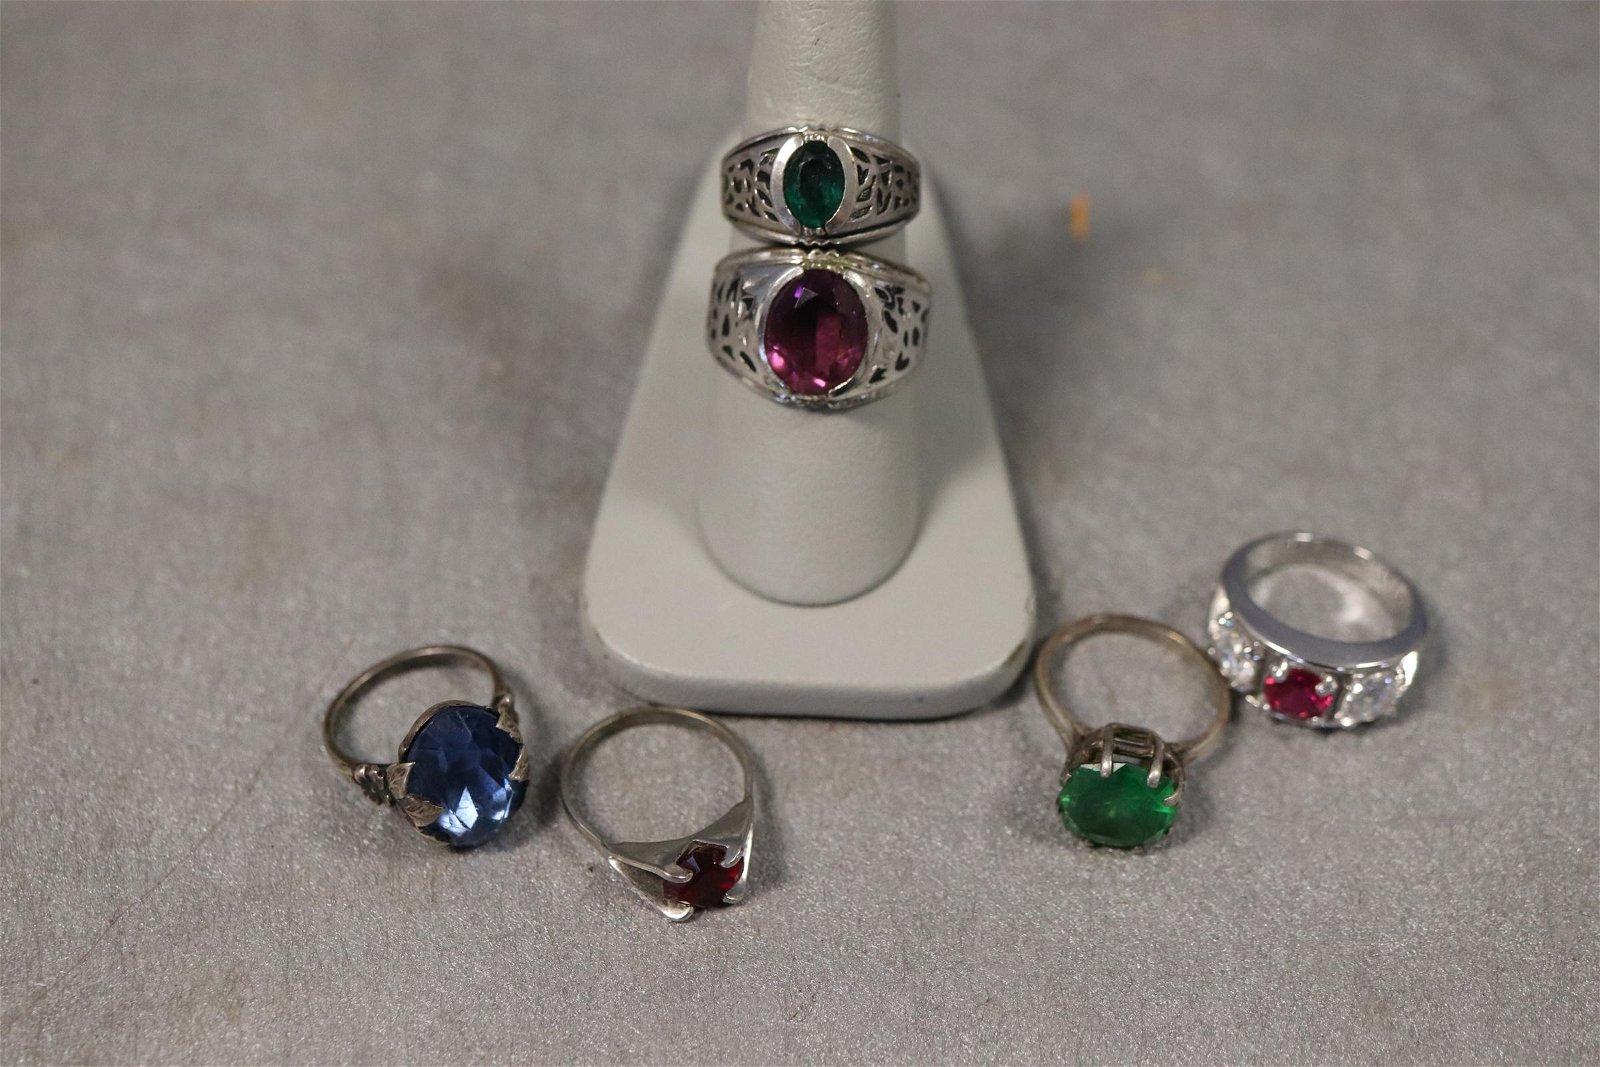 Lot of 6 Vintage Sterling Silver Rings